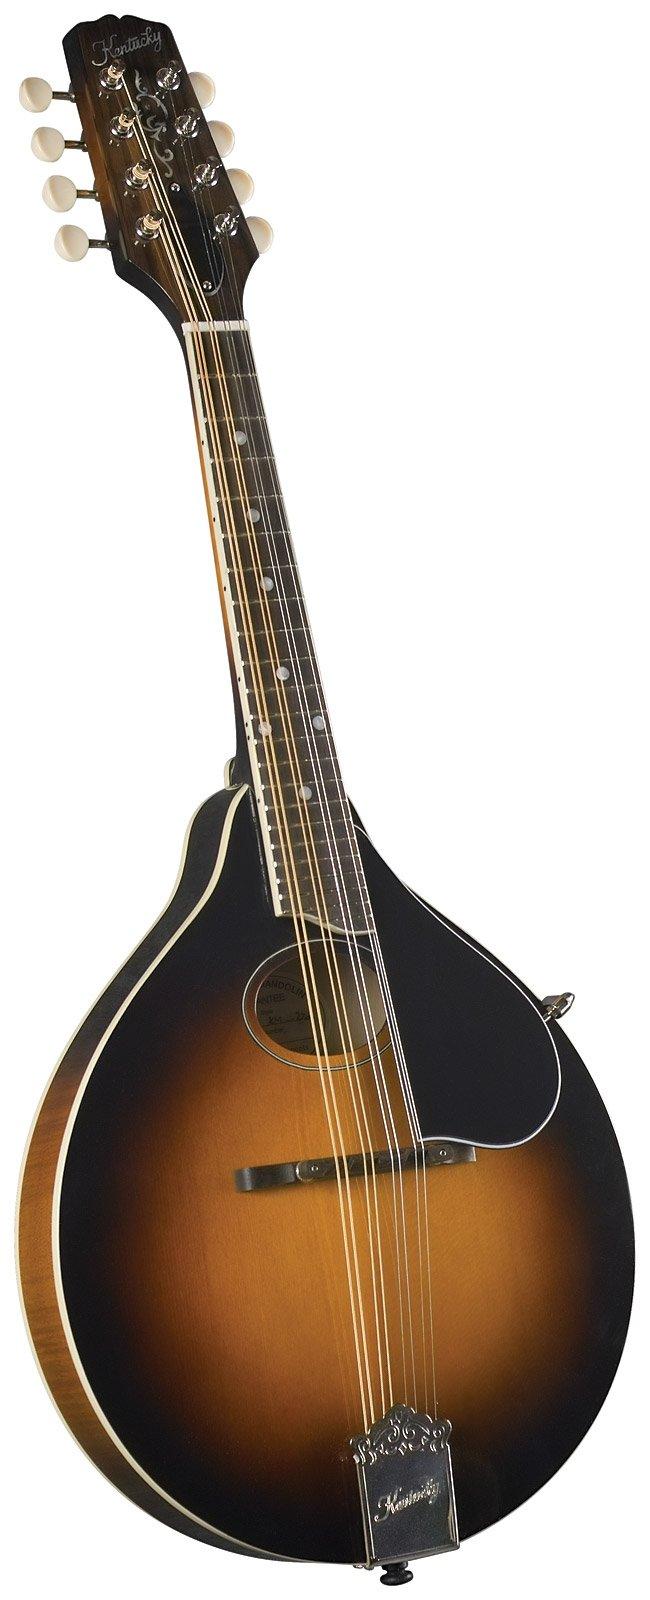 Kentucky KM-270 Artist Oval Hole A-Style Mandolin - Sunburst